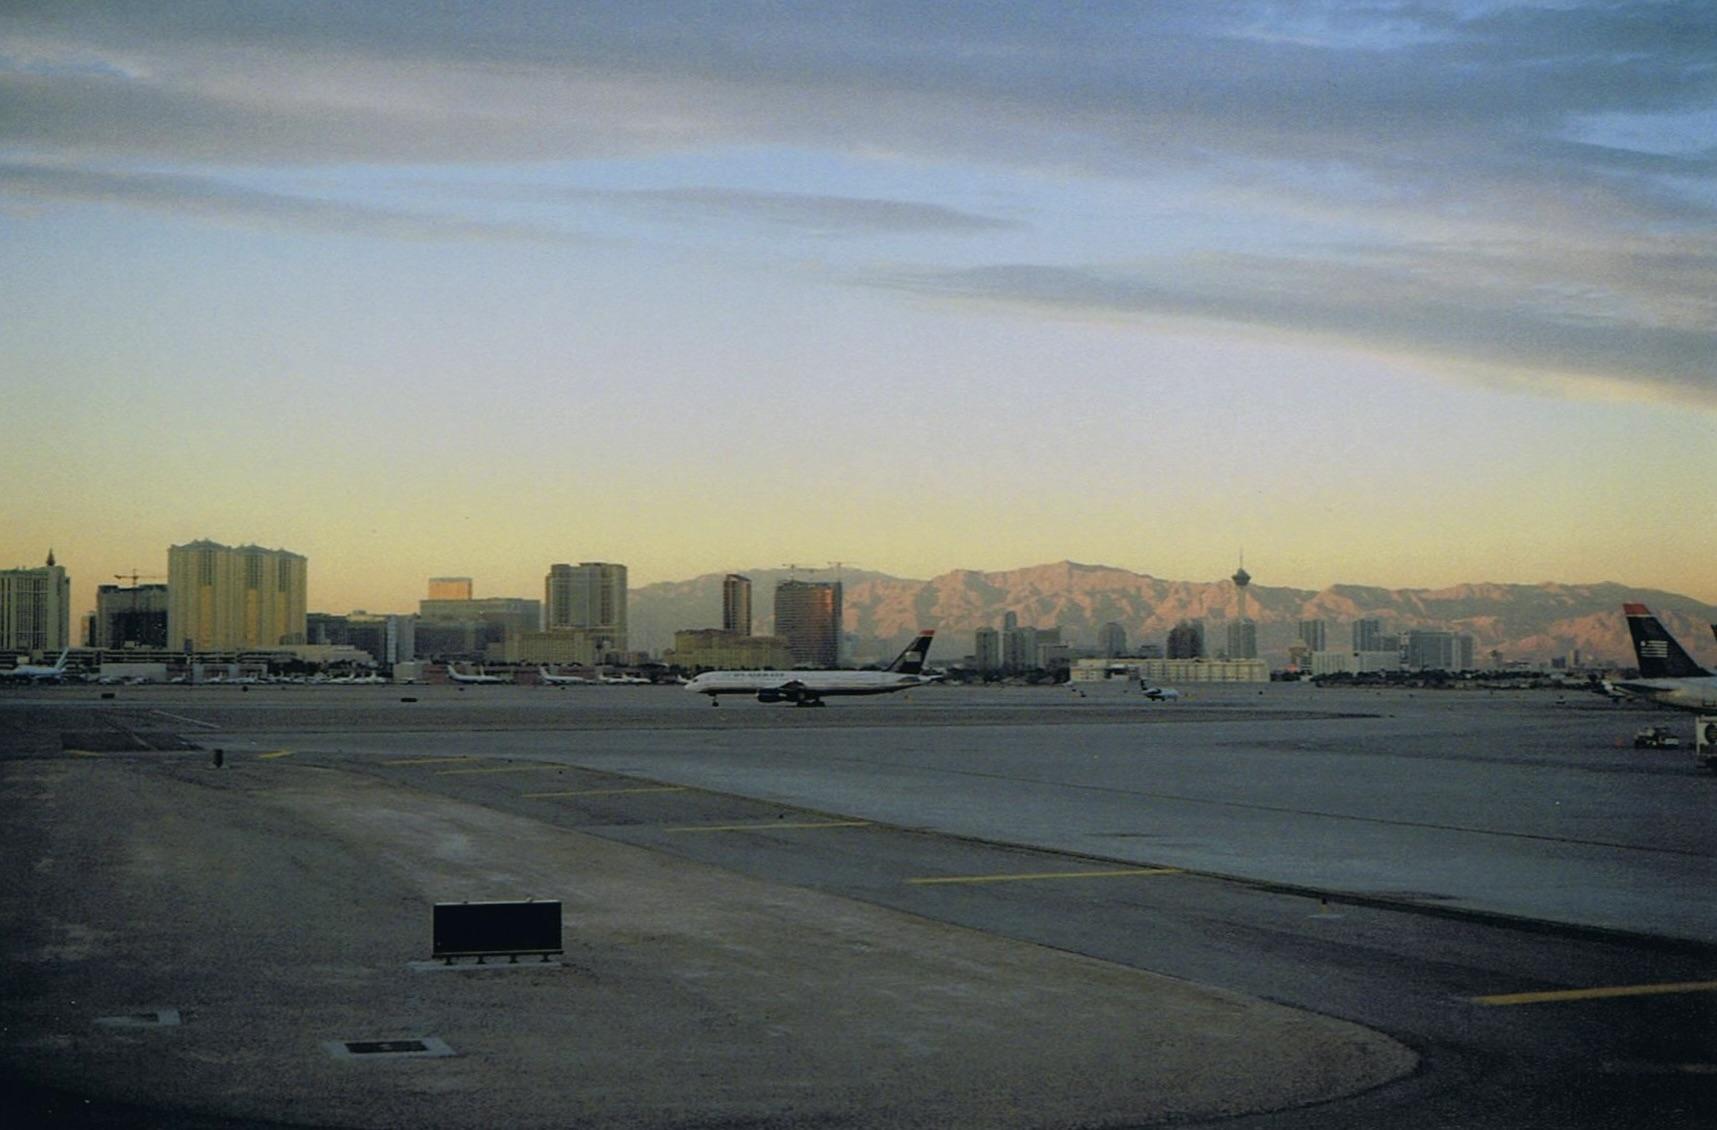 McCarran International Airport's main taxiway.